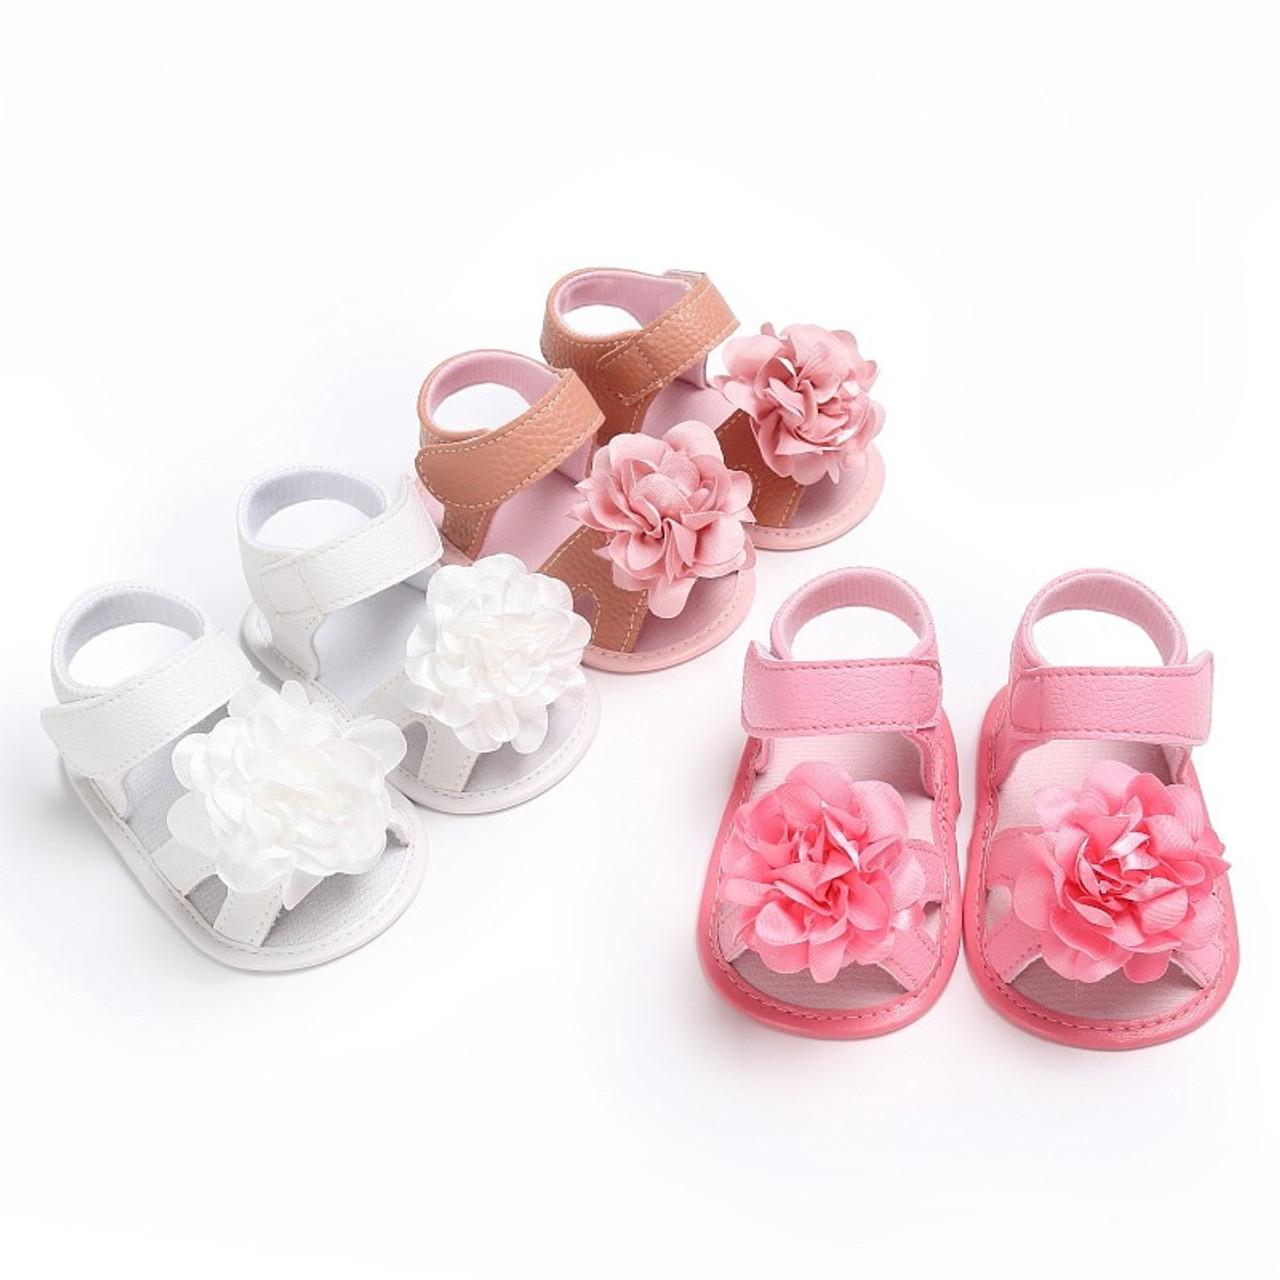 Sweet Baby Girls Princess Polka Dot Big Bow Infant Toddler Ballet Dress Soft Soled Anti-slip Shoes Footwear Prewalkers New Baby Shoes Mother & Kids